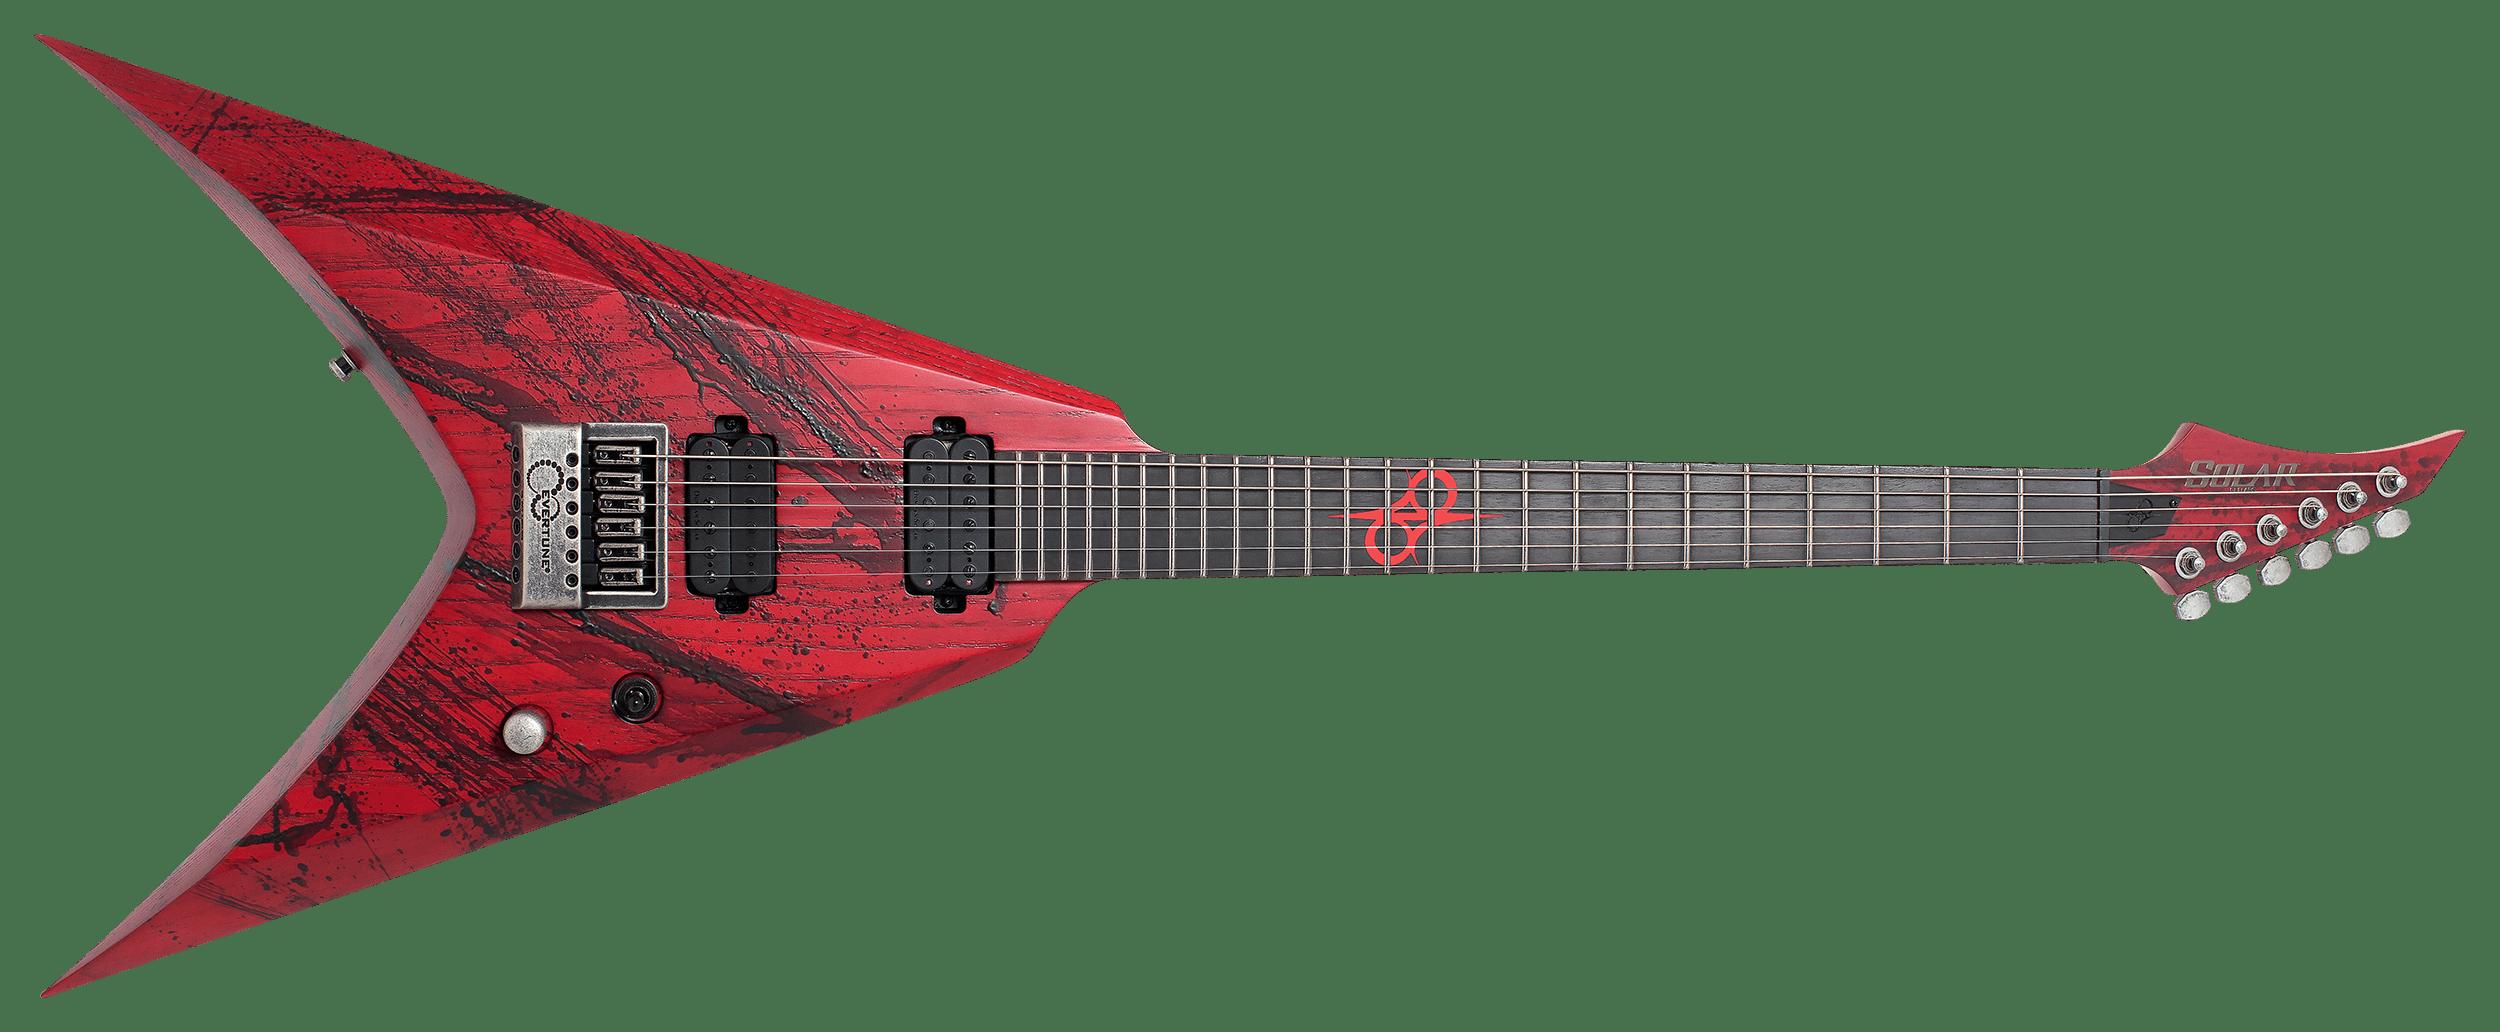 Solar Guitars Canibalismo V.1 6-string